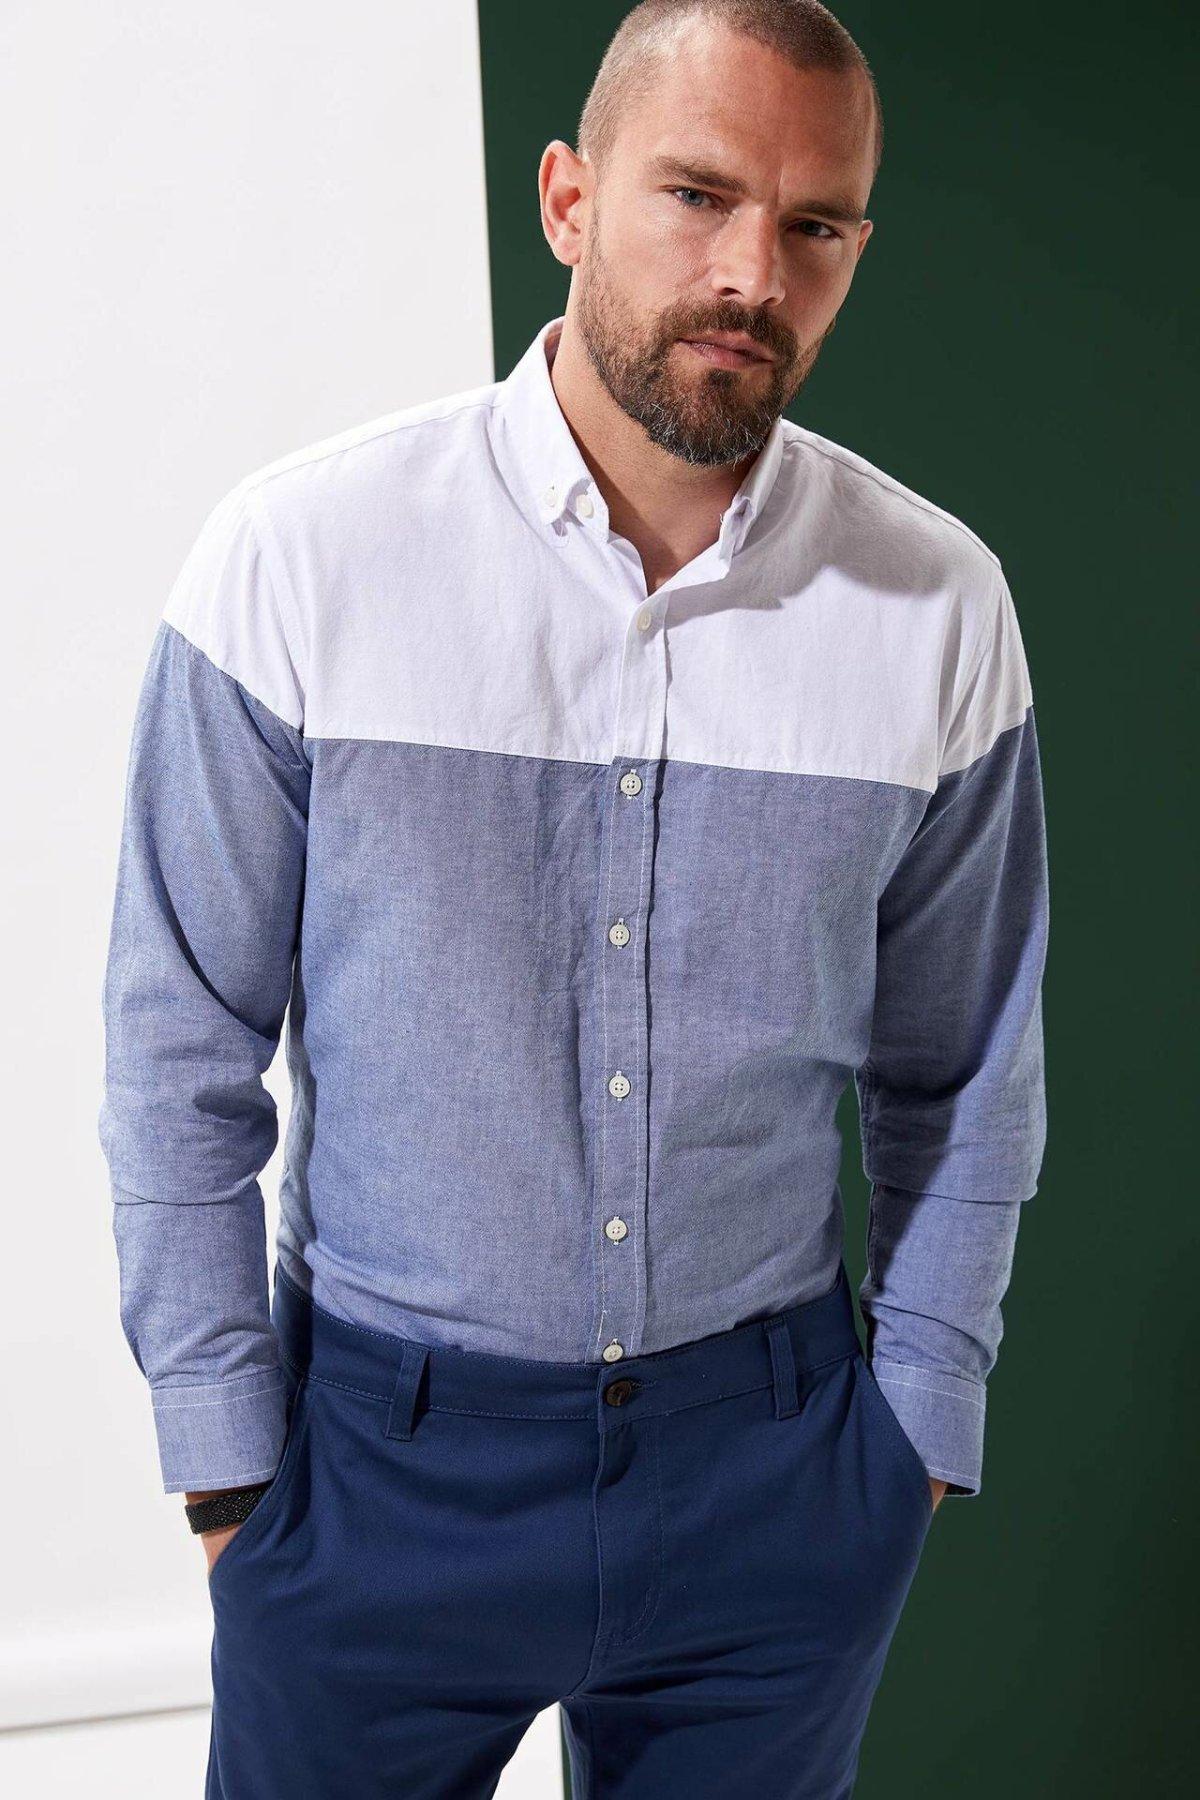 DeFacto Men Fashion Patchwork Shirts Long Sleeve Shirts Mens Casual Lapel Collar Casual Shirt Tops New - L5607AZ19AU